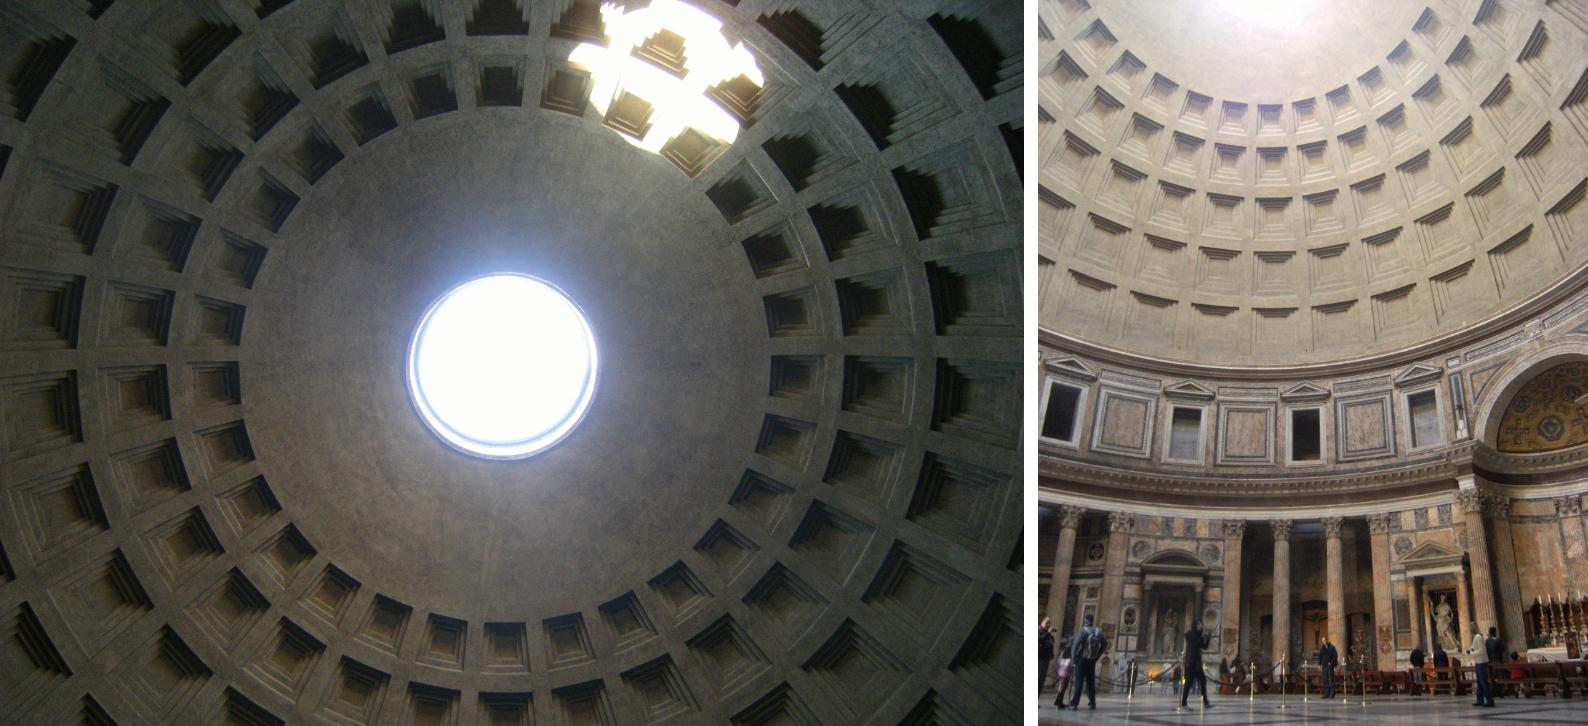 Italy - Rome - Pantheon - 5.1